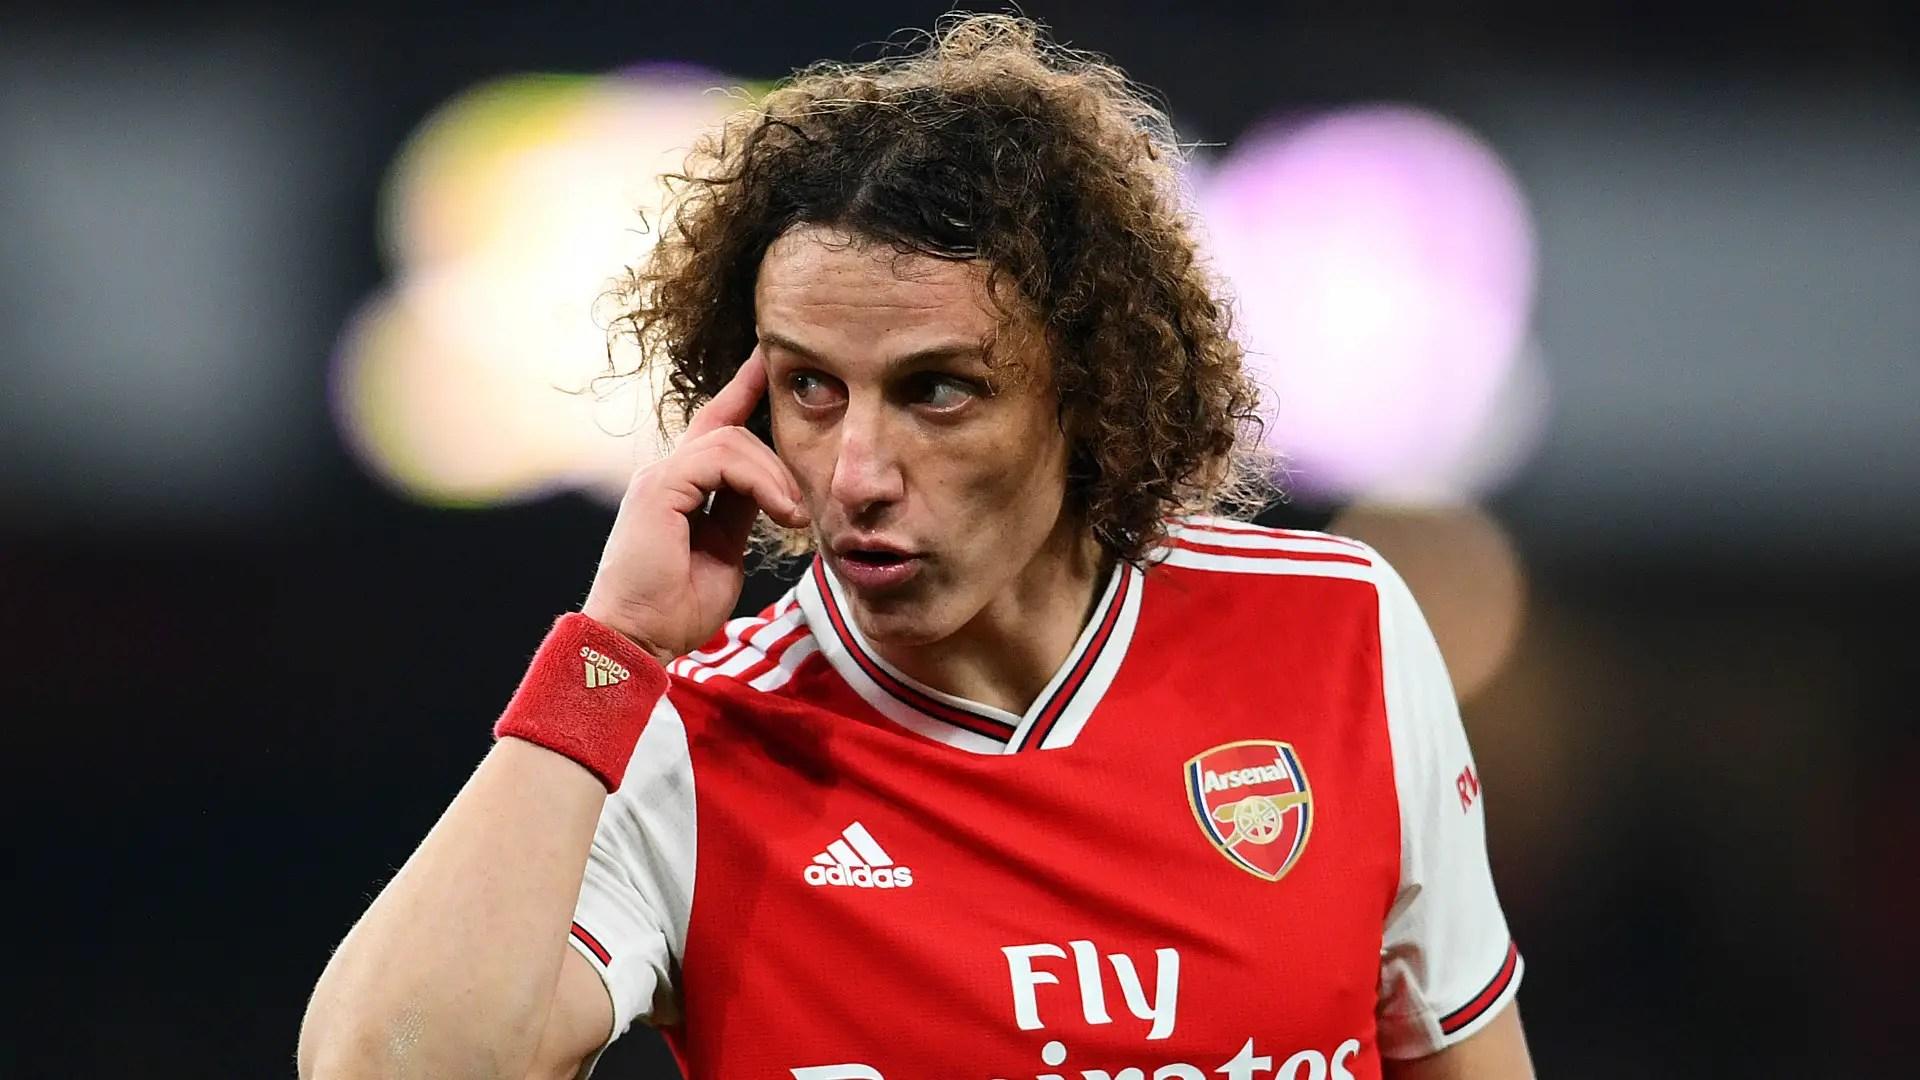 Why I Left Arsenal -Luiz